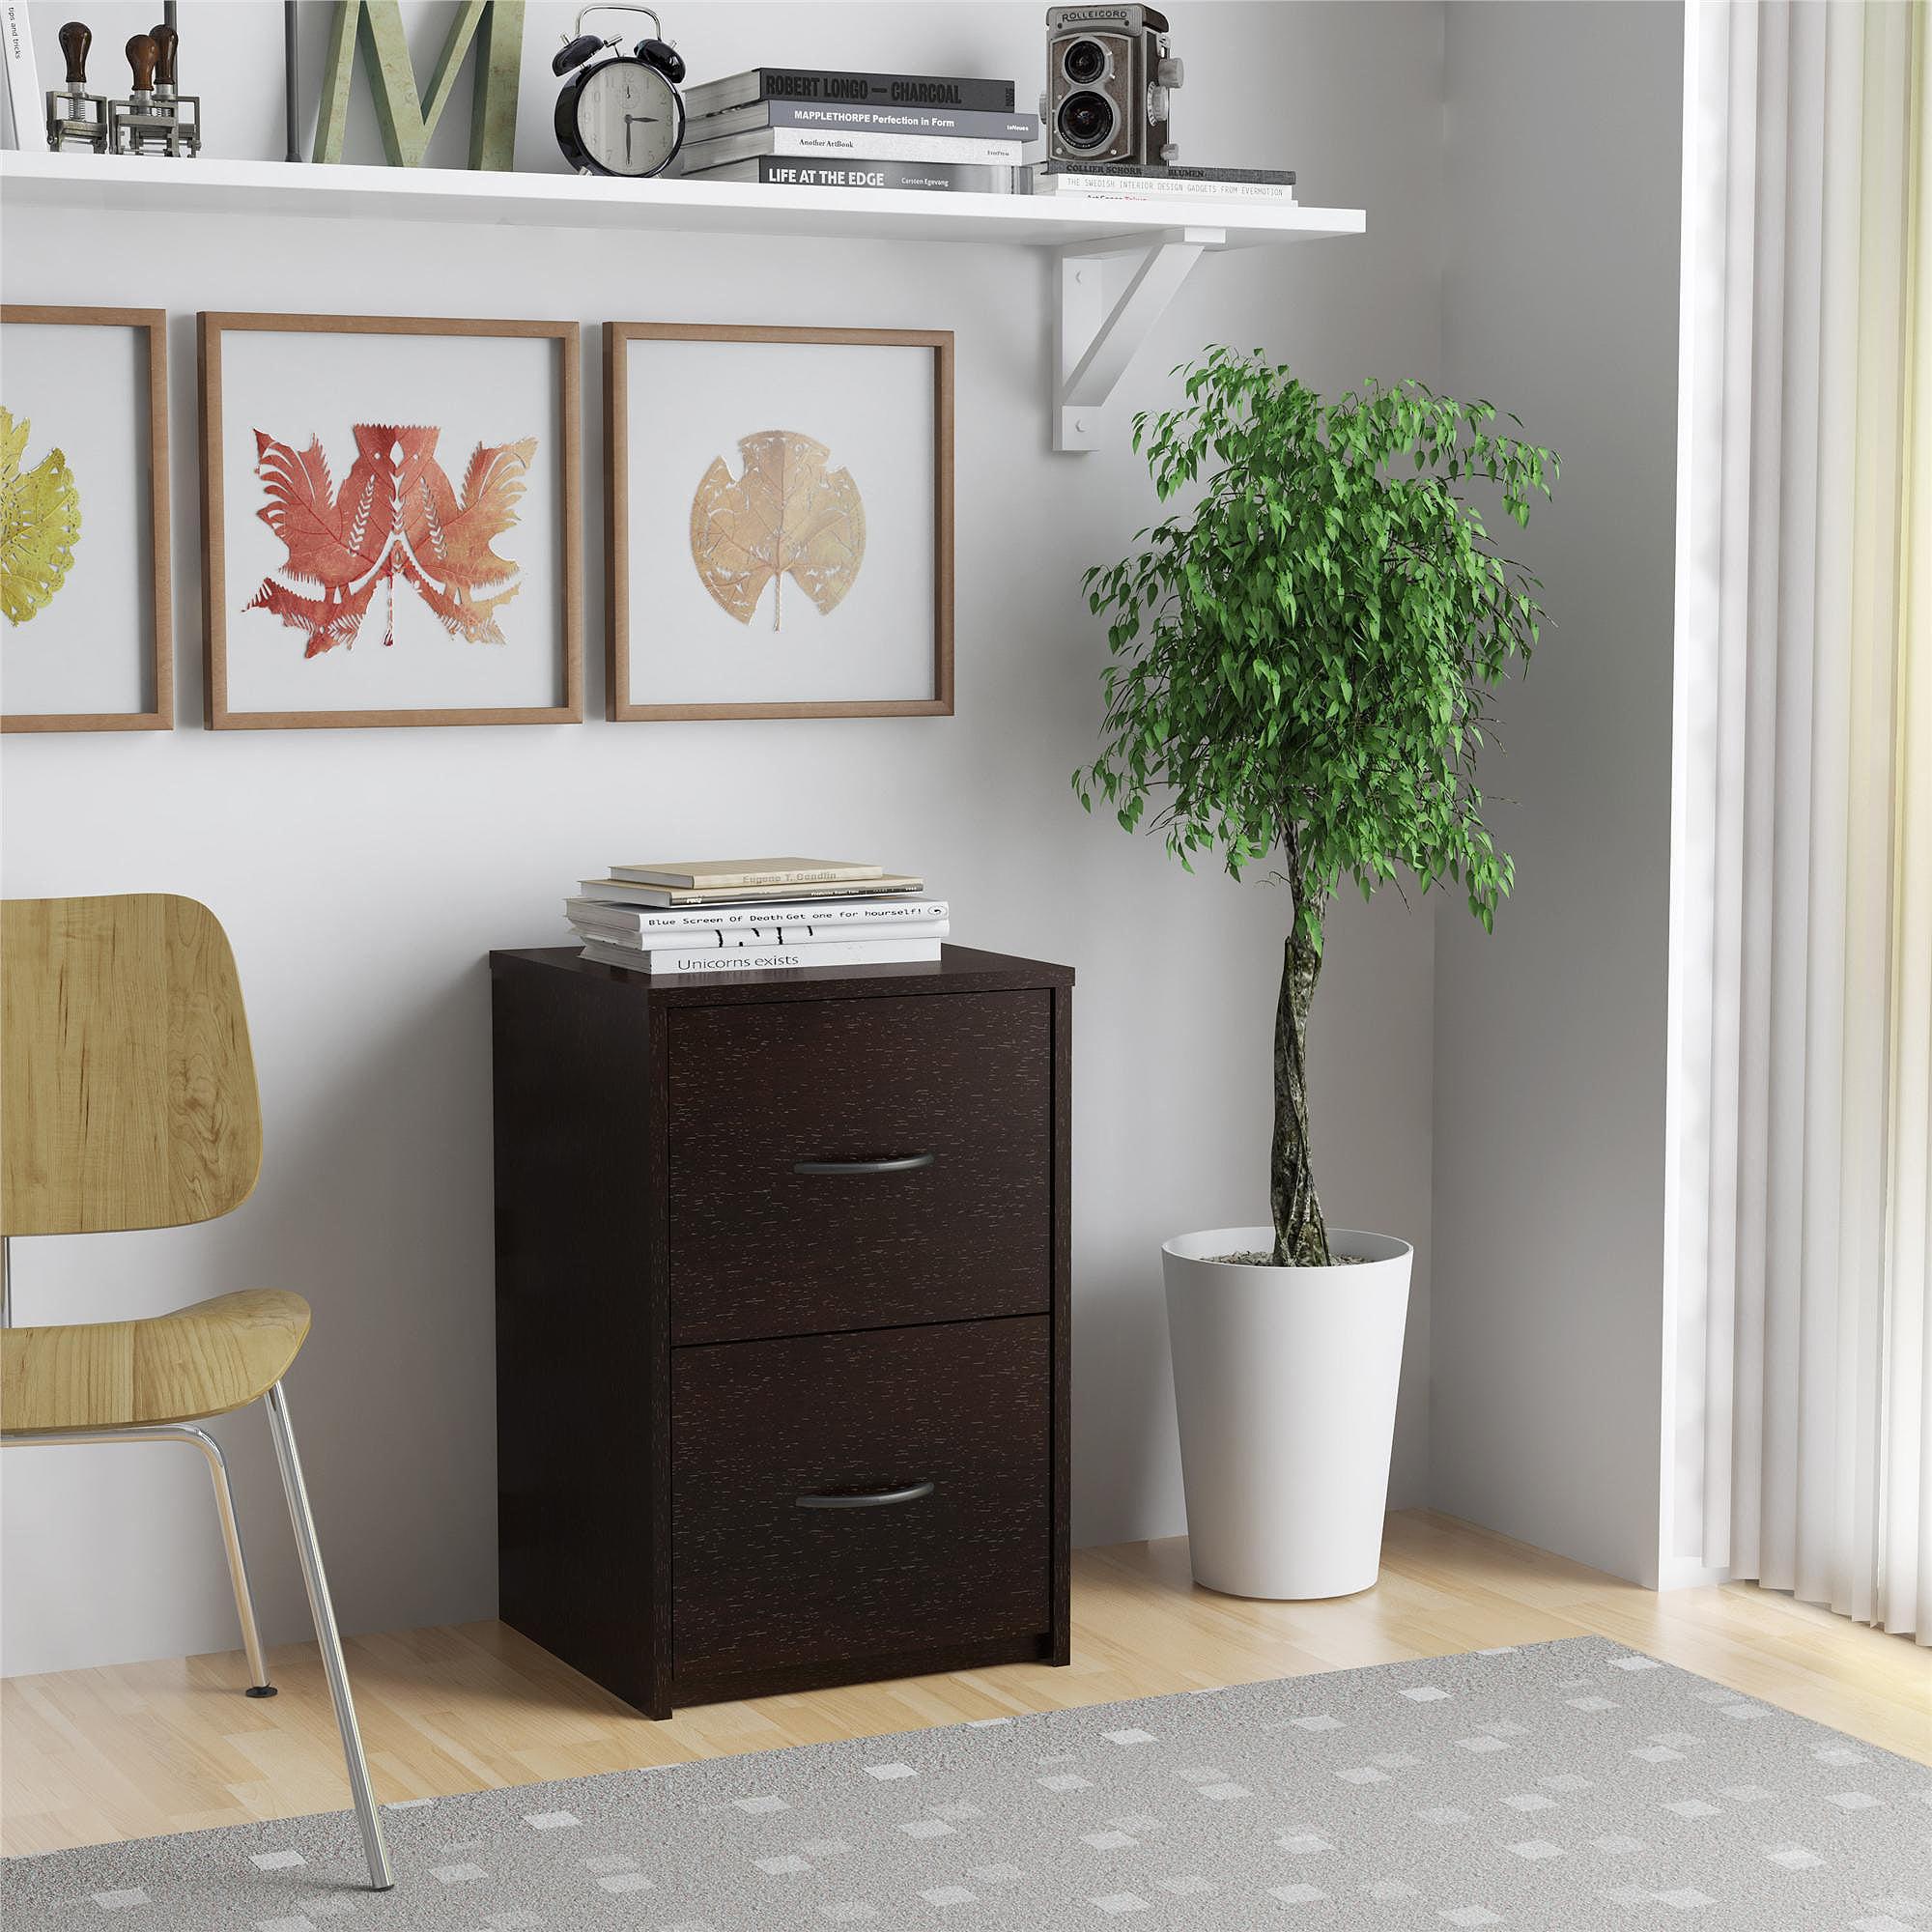 Wood File Cabinet 2 Drawer ameriwood home core 2 drawer file cabinet, espresso - walmart